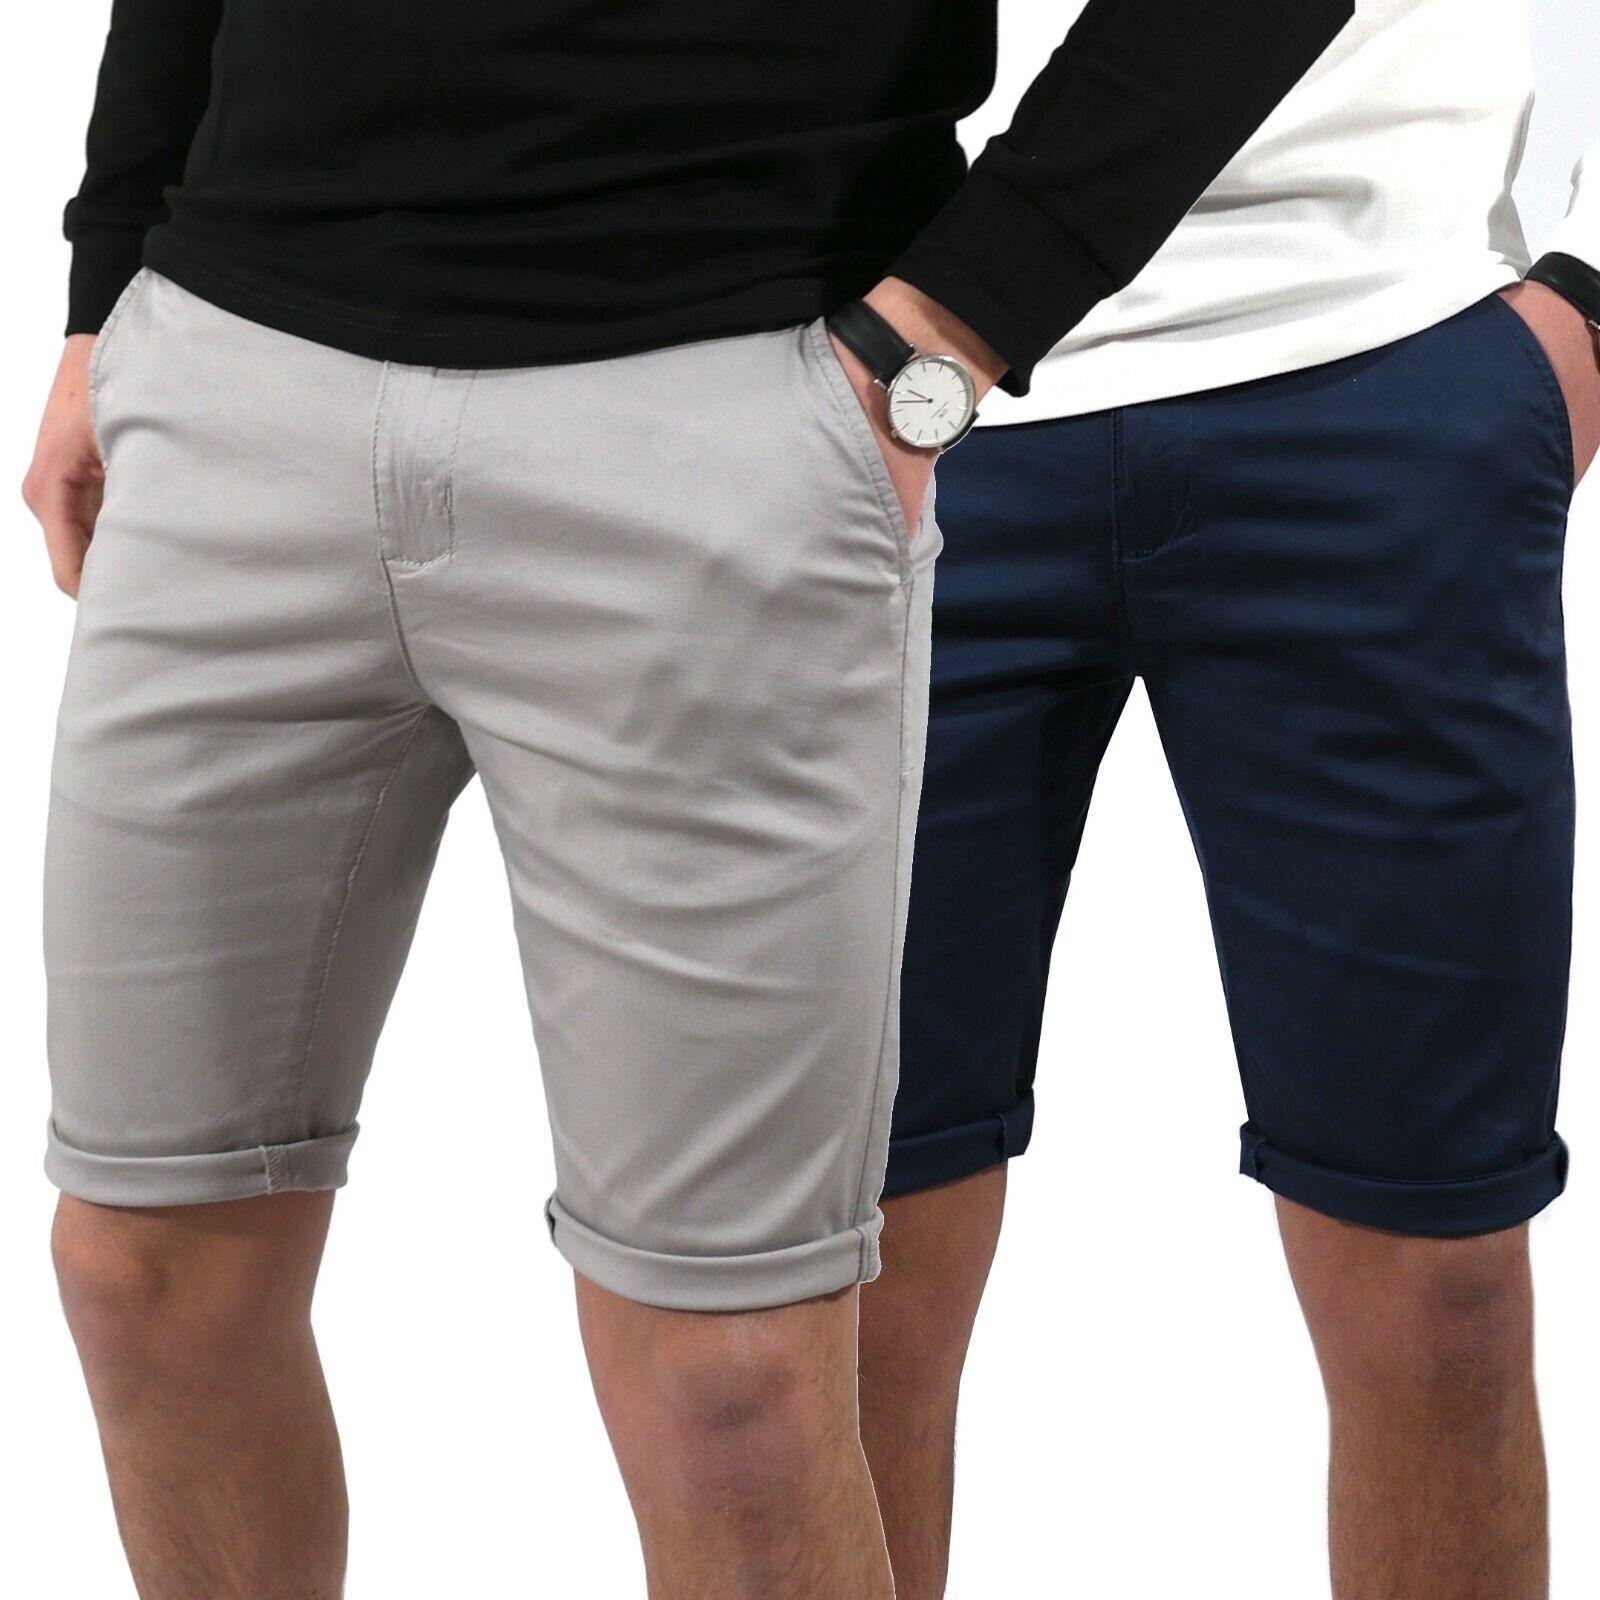 Pantaloni corti uomo cotone mod. america Bermuda Pantaloncini 44 46 48 50 52 54